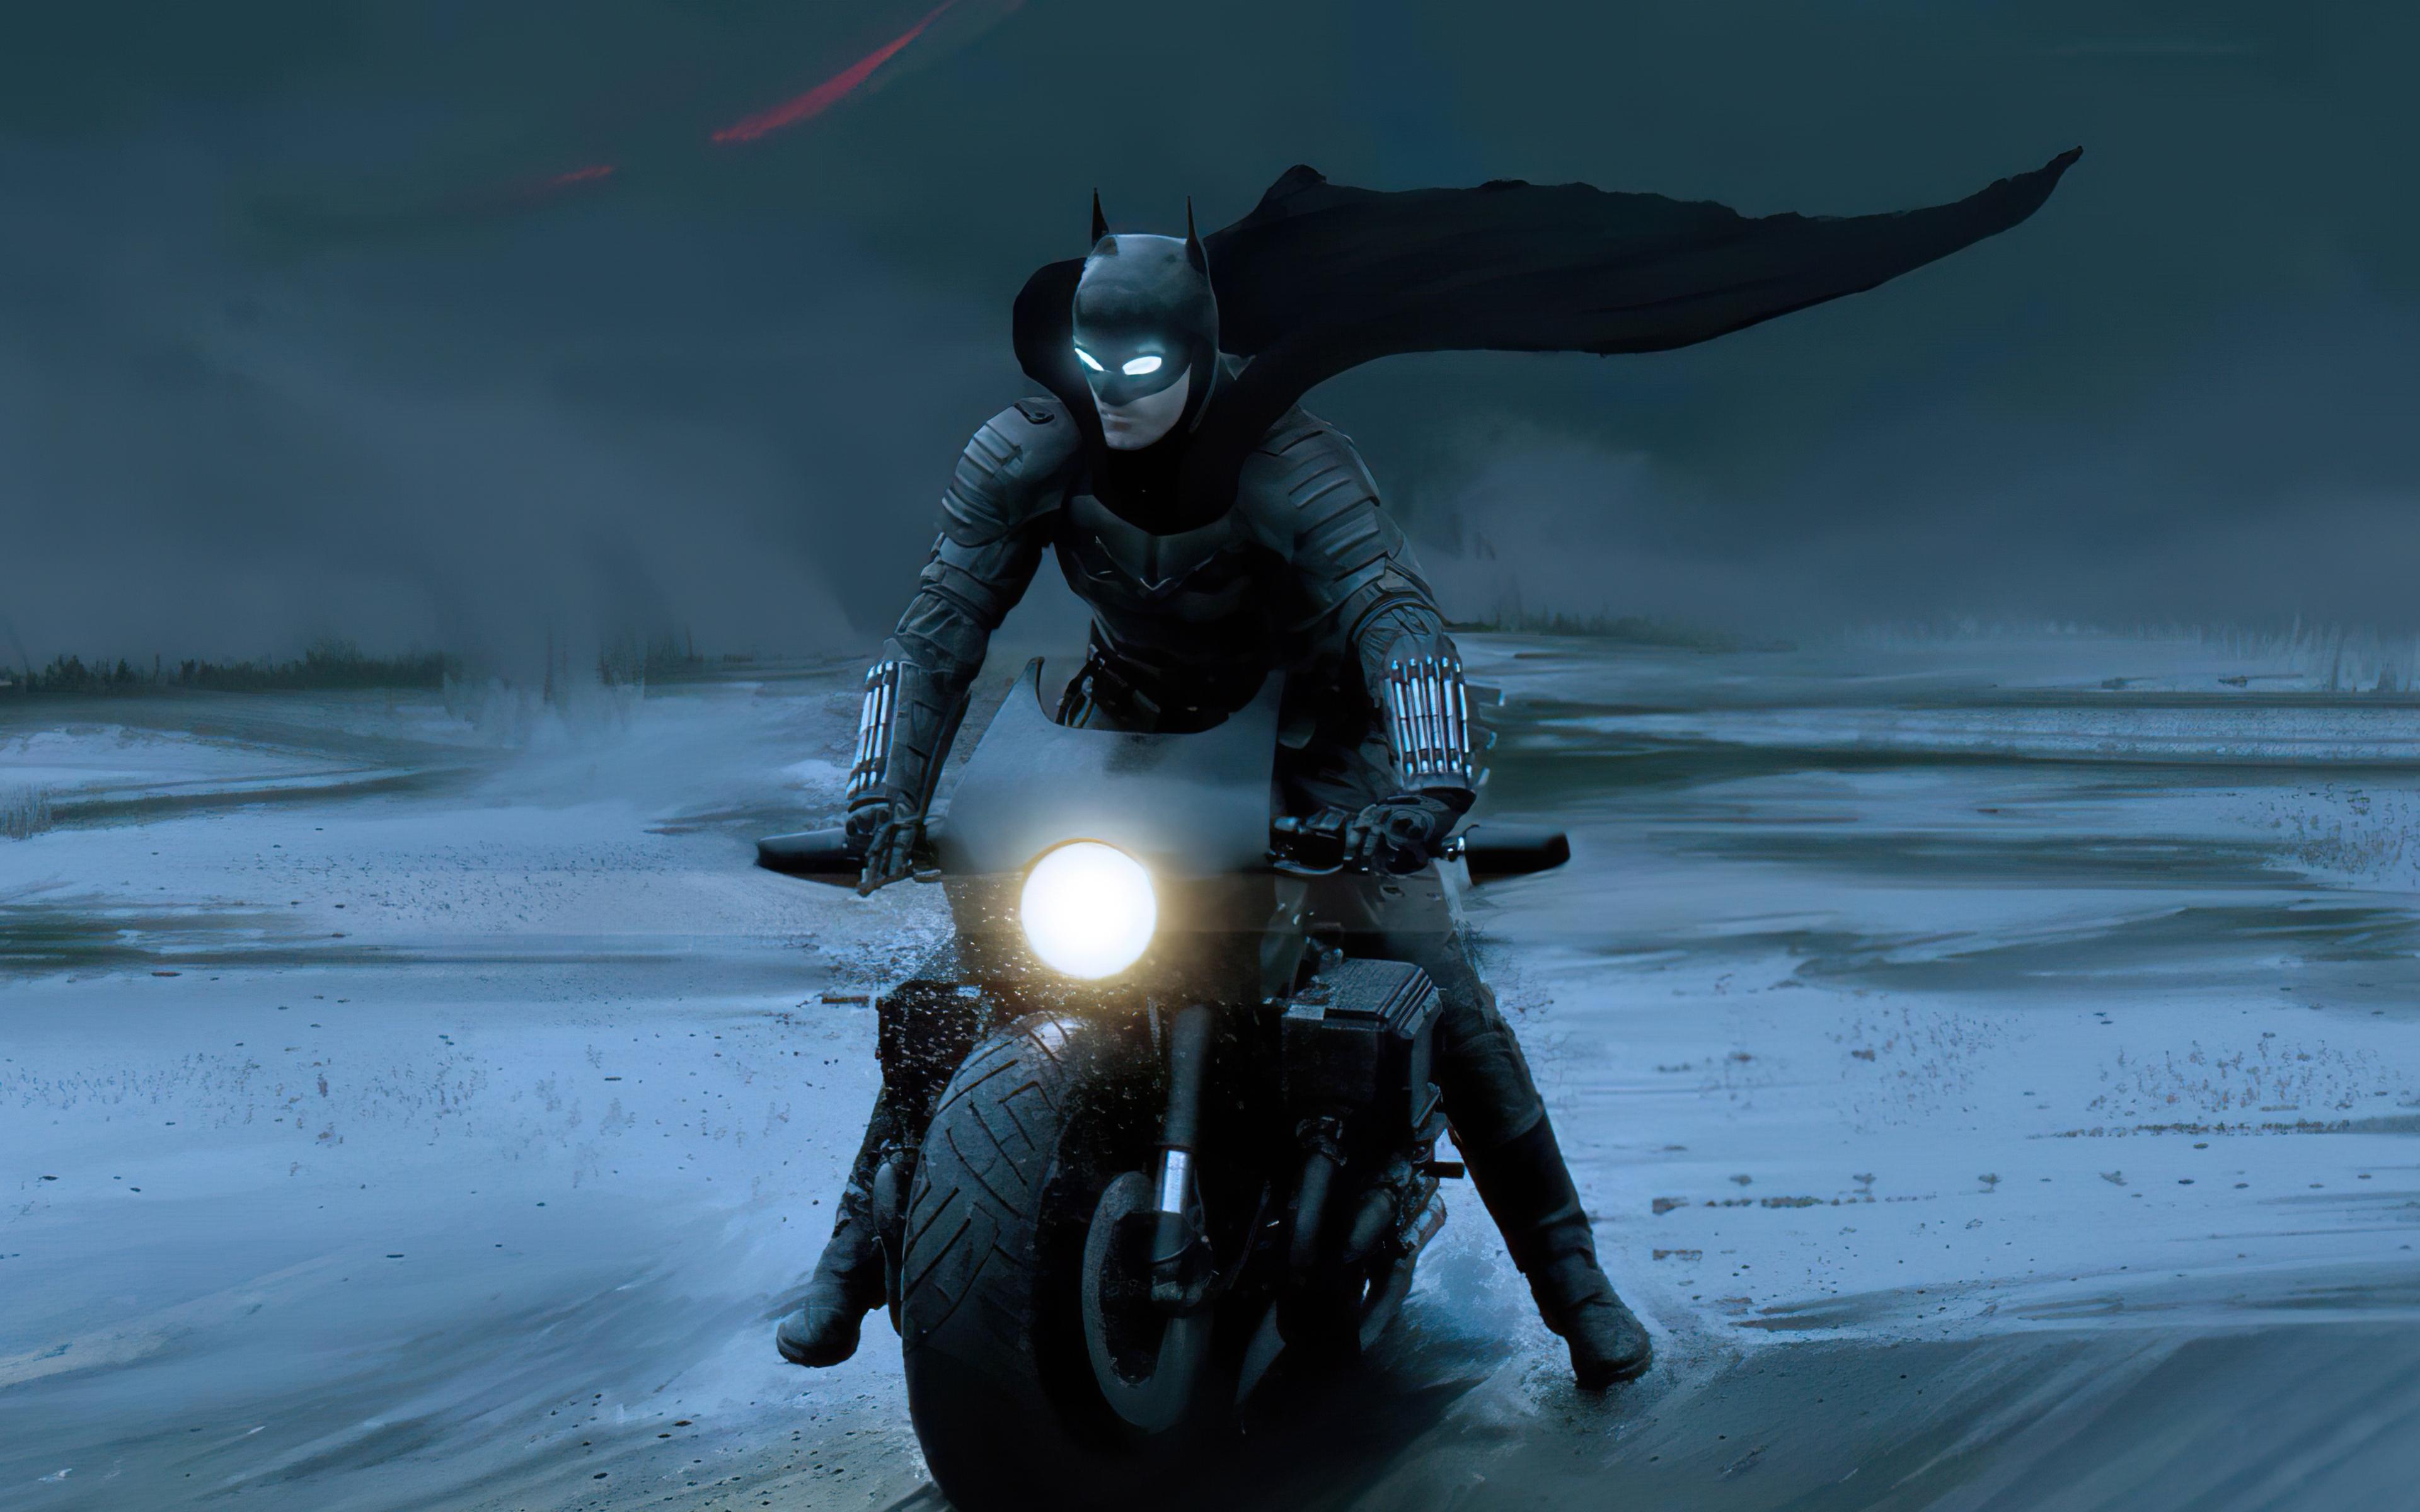 the-batman-on-batcycle-4k-gm.jpg